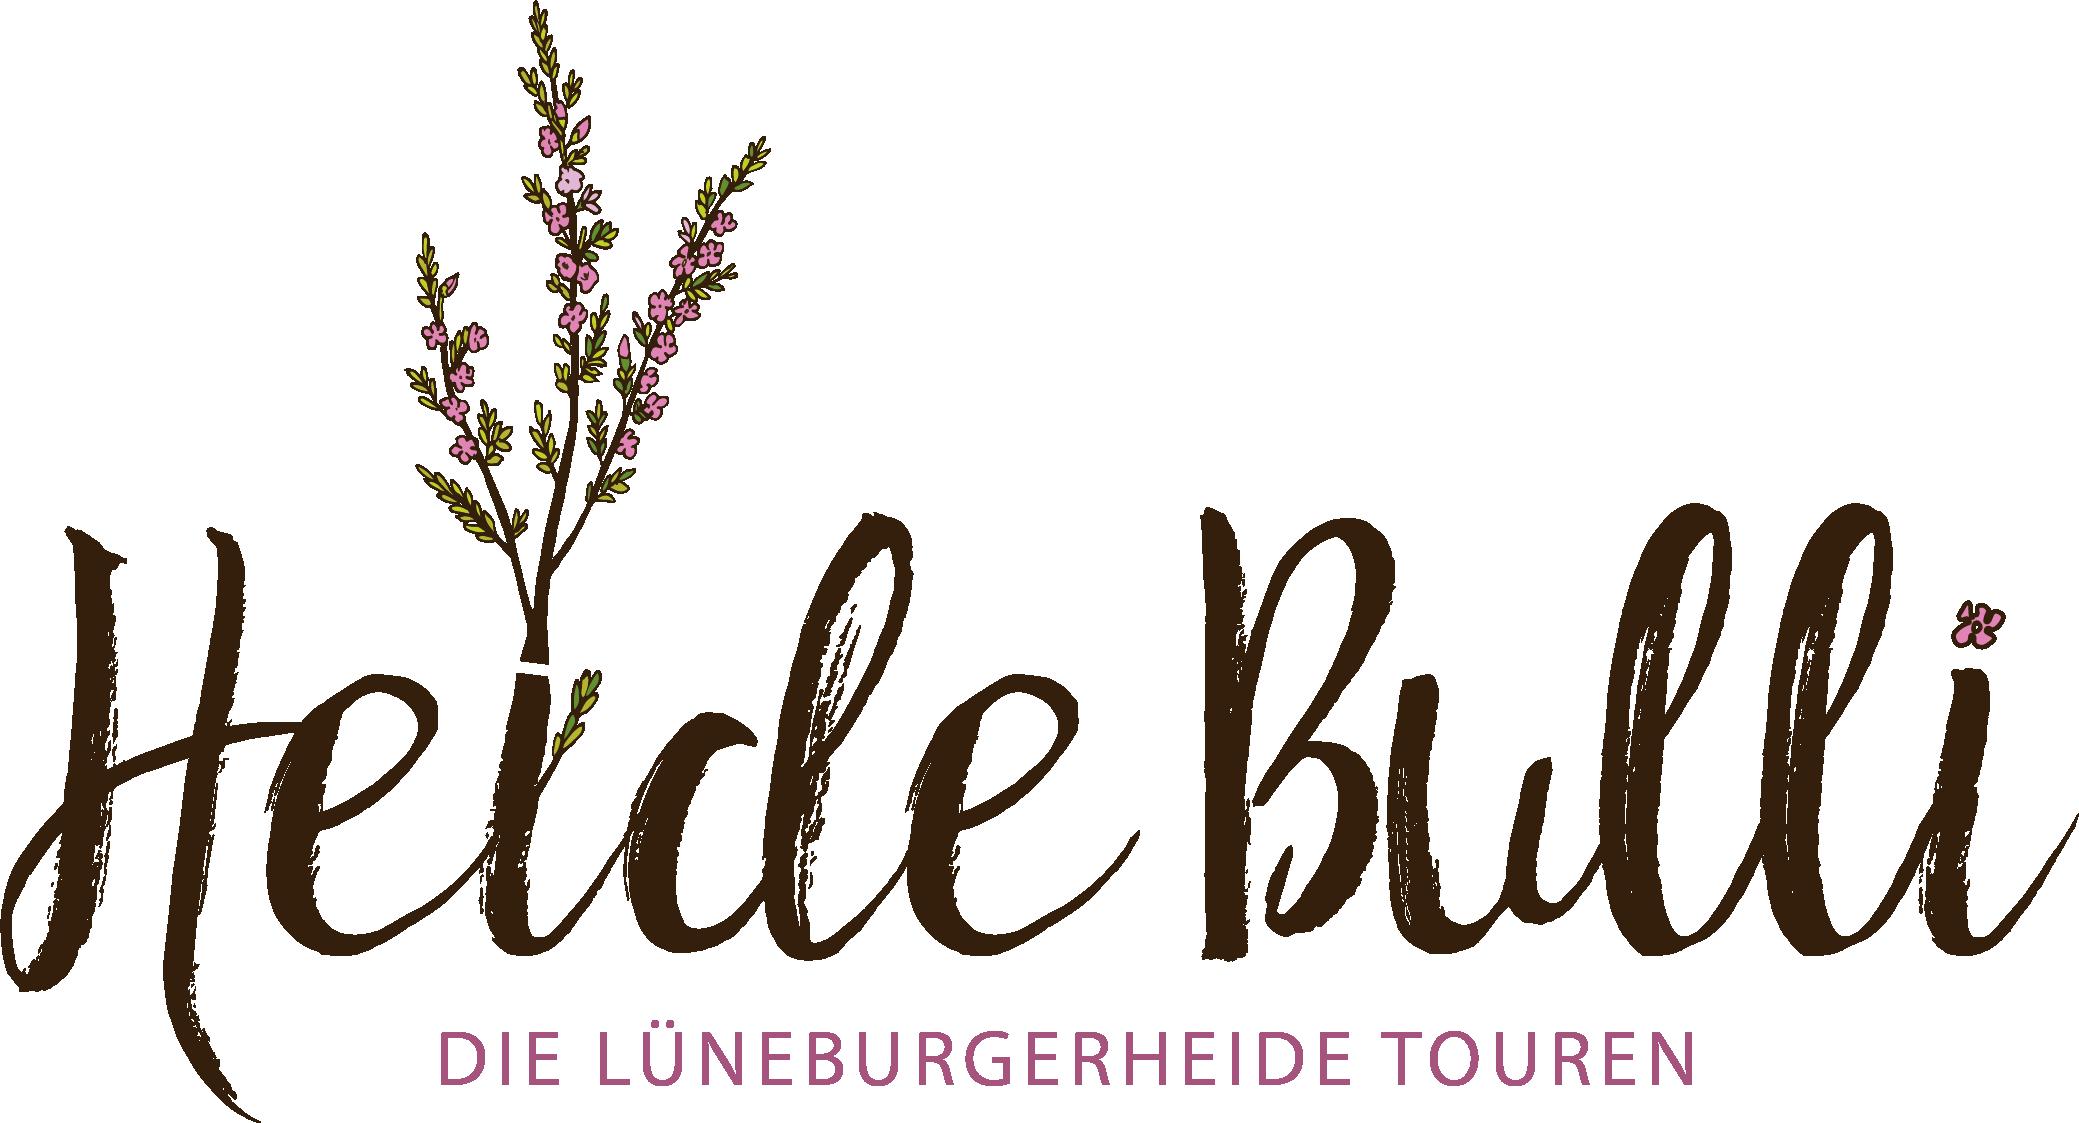 heidebulli_logo